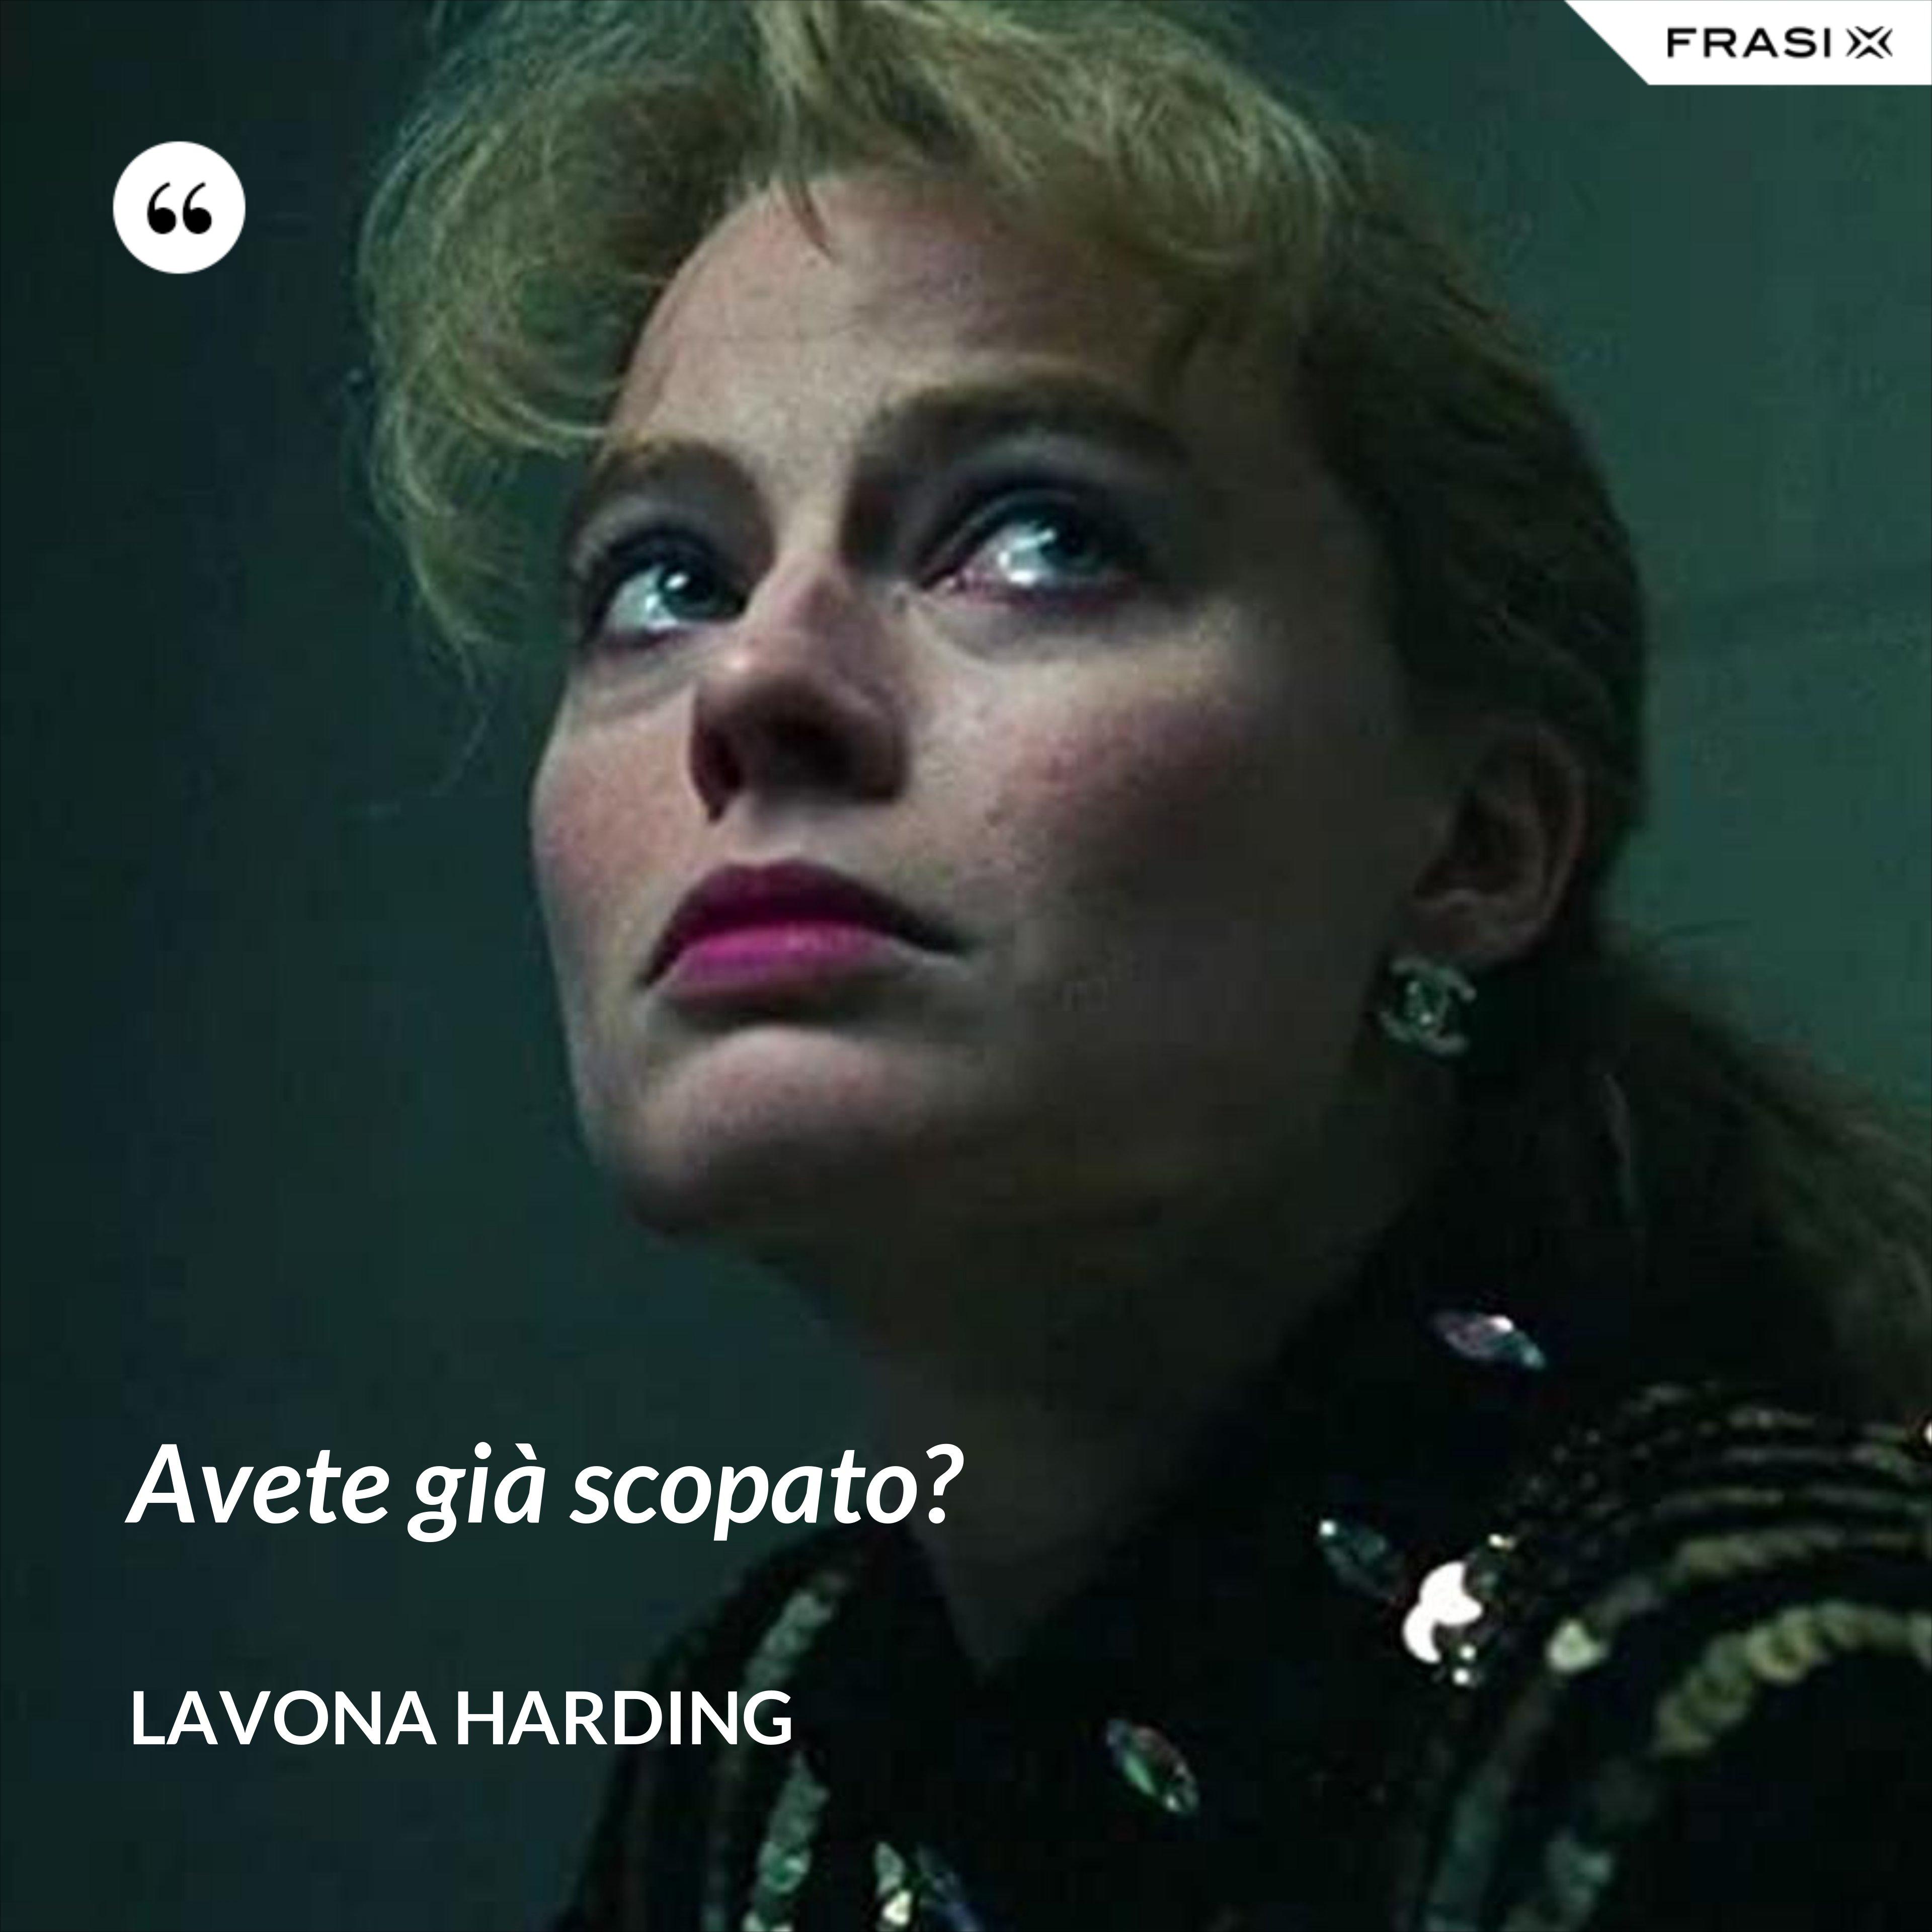 Avete già scopato? - LaVona Harding